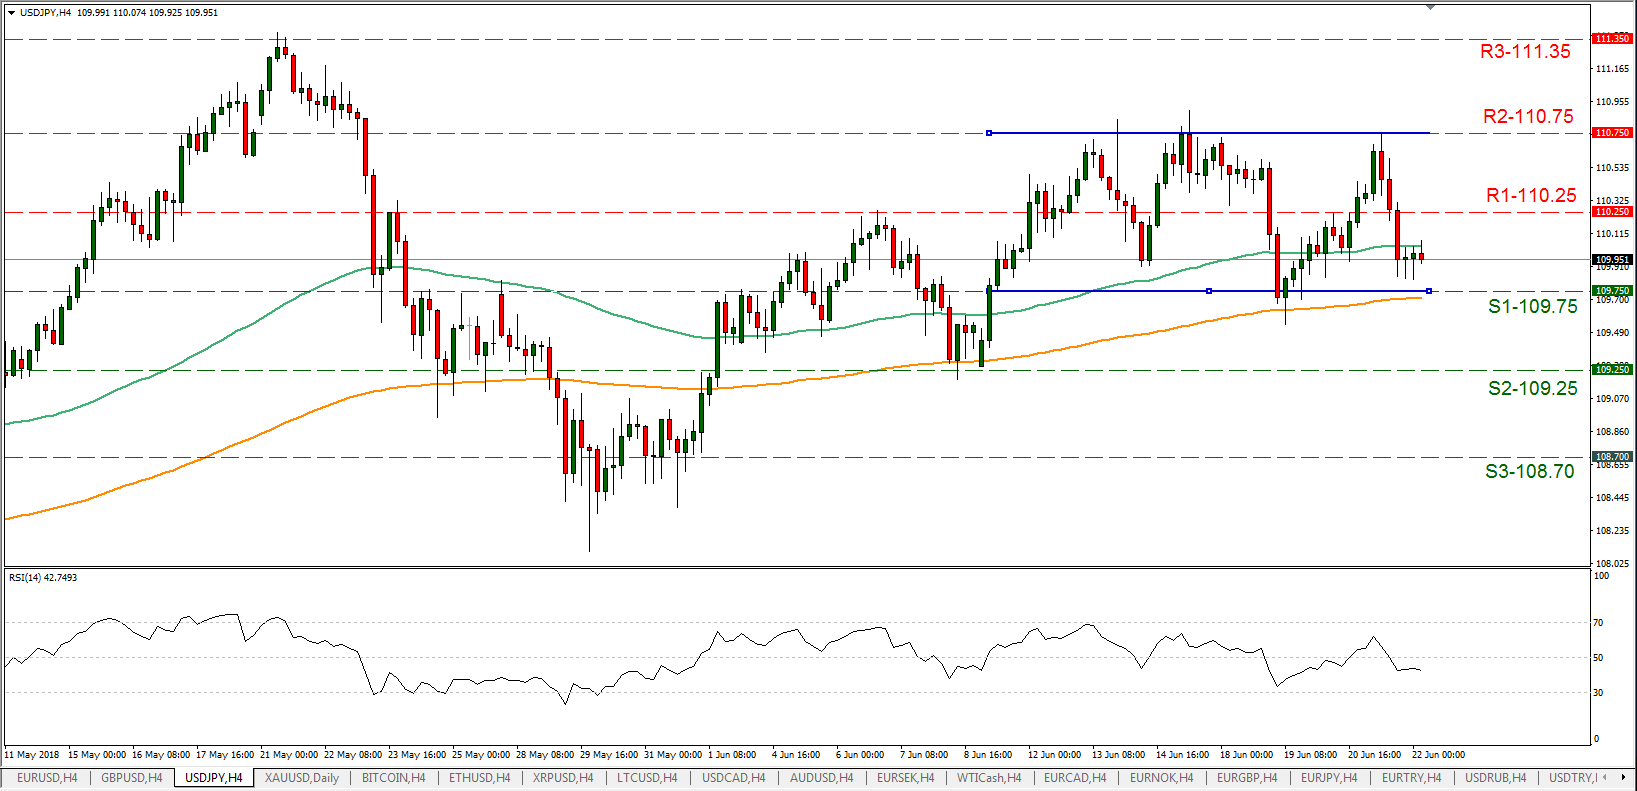 USD/JPY 22/06/2018 | EconAlerts